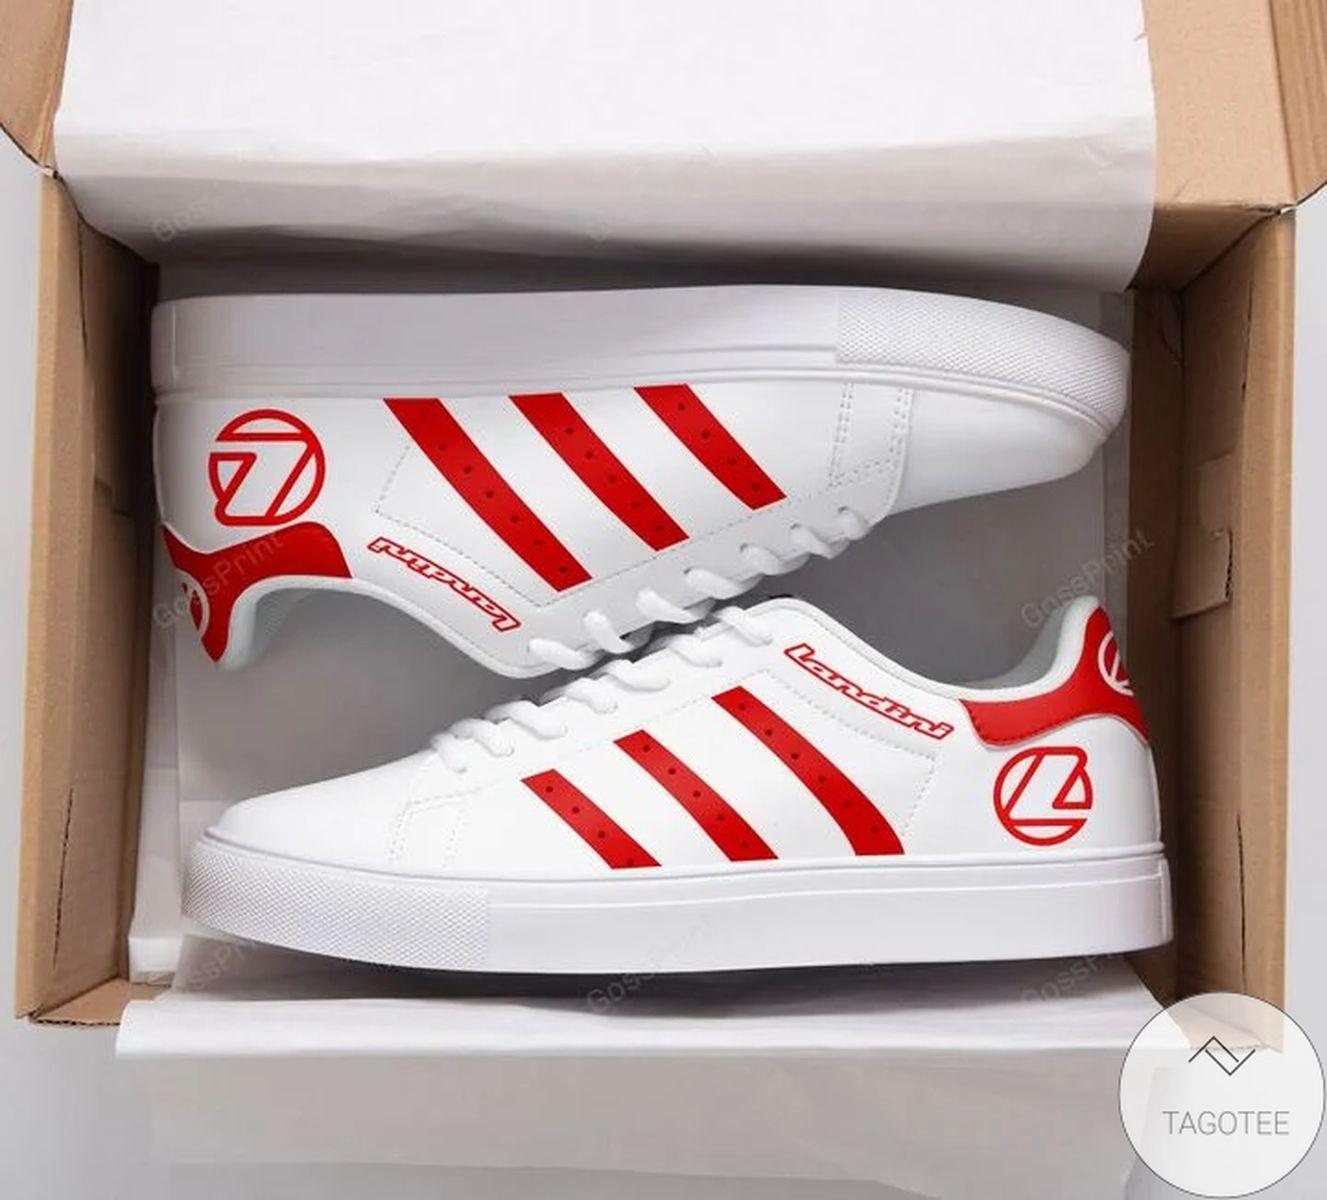 Landini Stan Smith Shoes